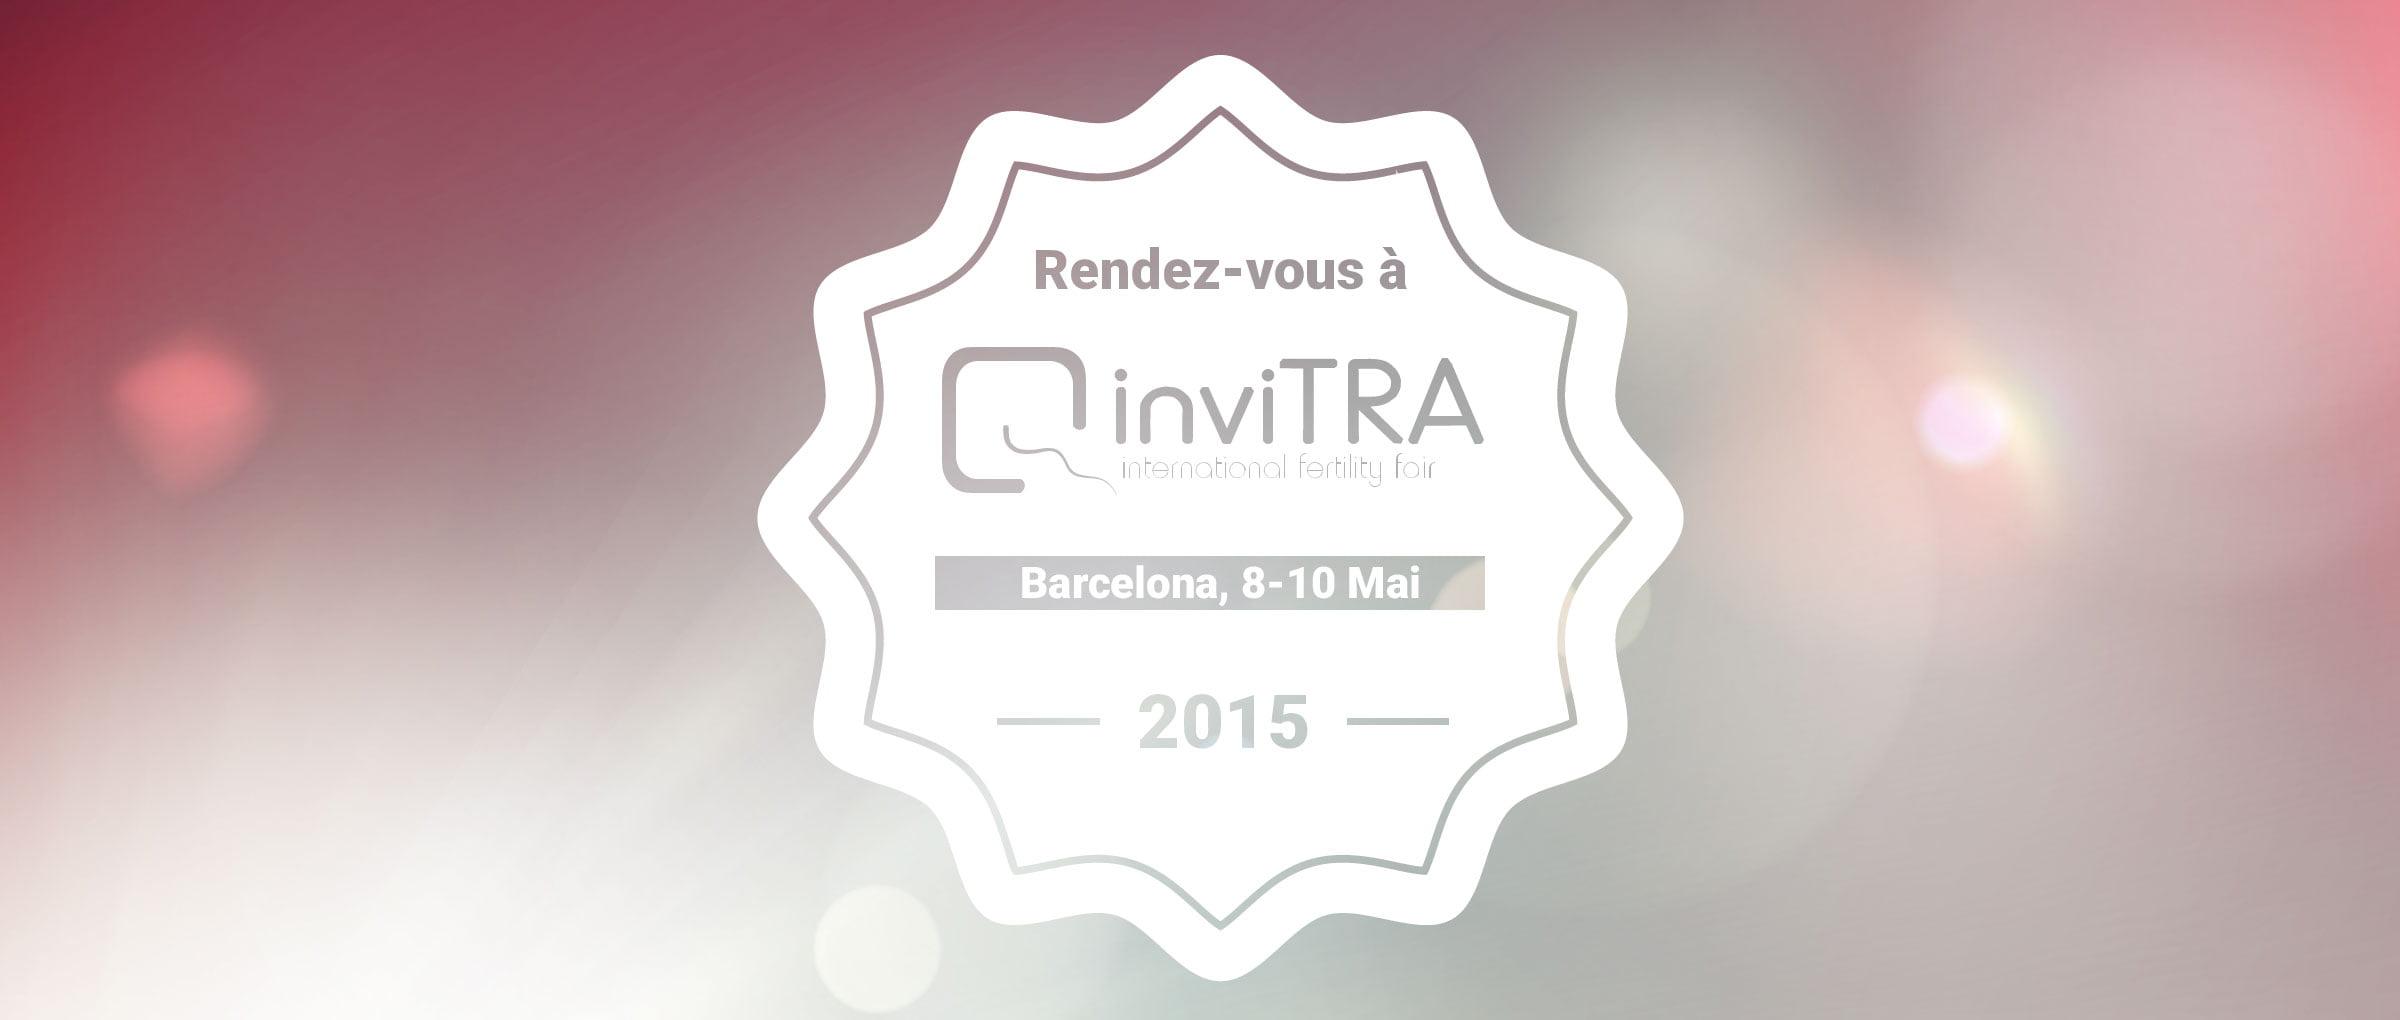 logo-feria-invitra-2015